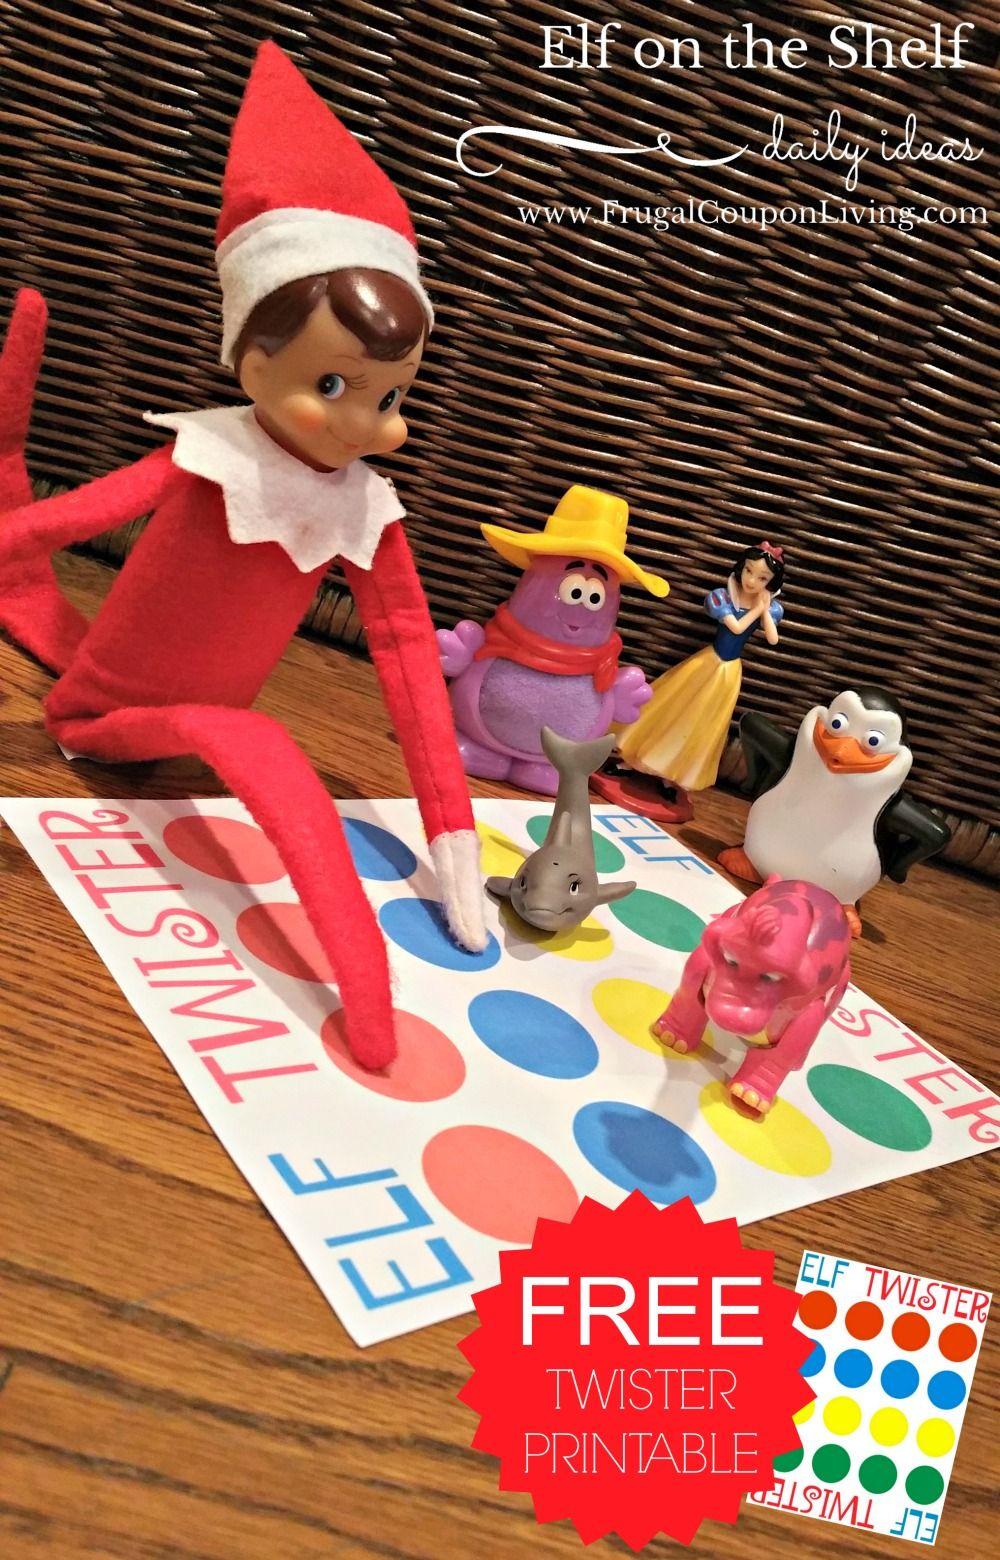 Elf On The Shelf Ideas | Elf On The Shelf | Pinterest | Elf On The - Elf On The Shelf Free Printable Ideas